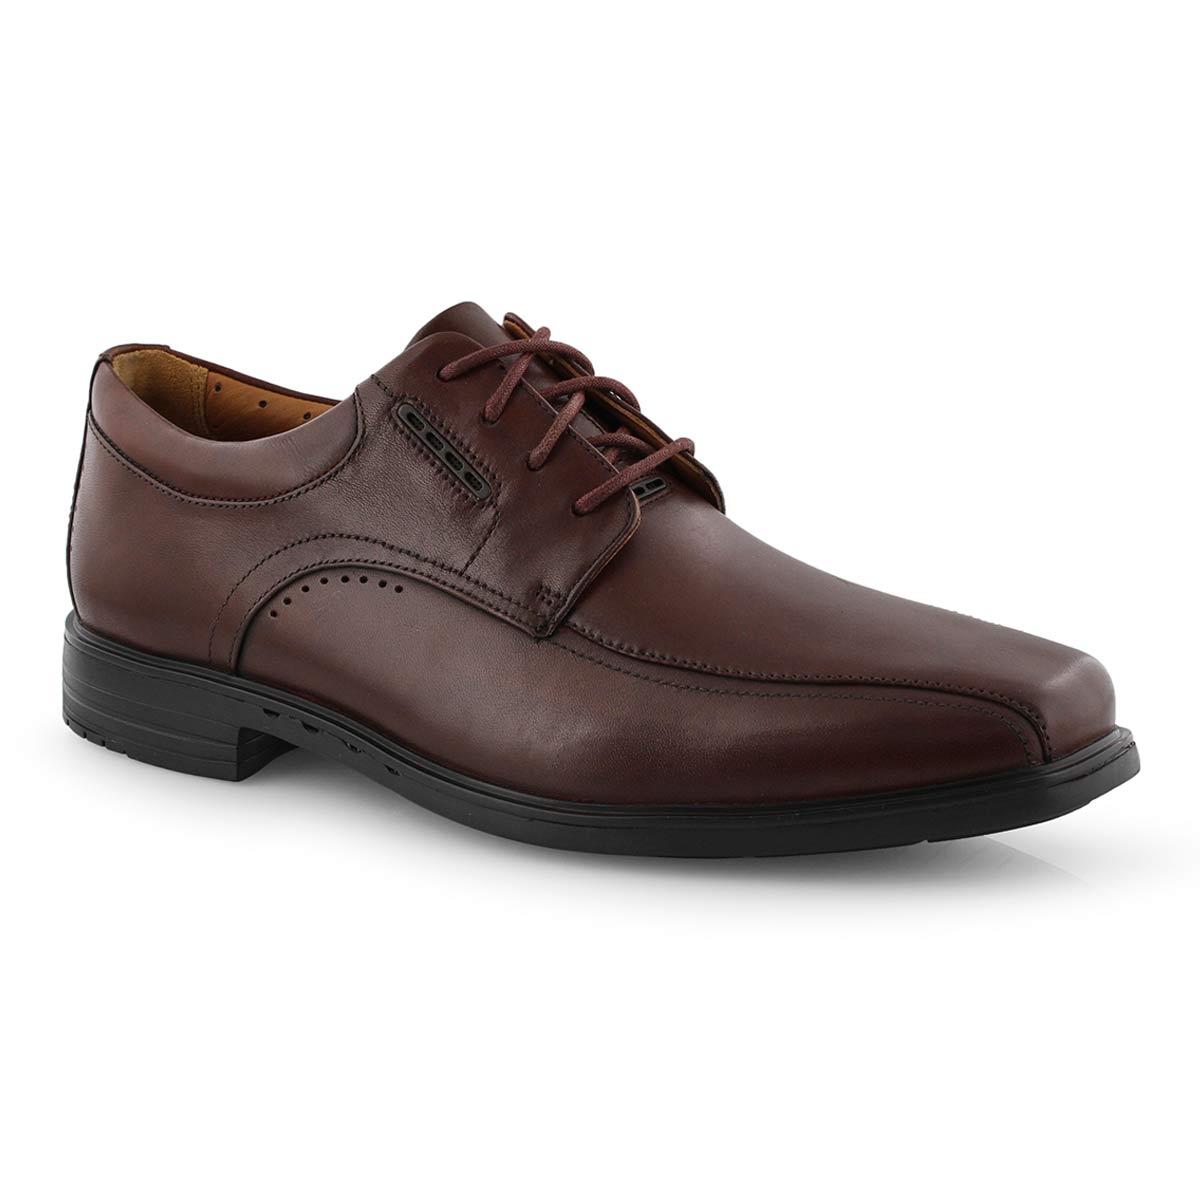 Mns UnKenneth Way brown dress shoe-wide